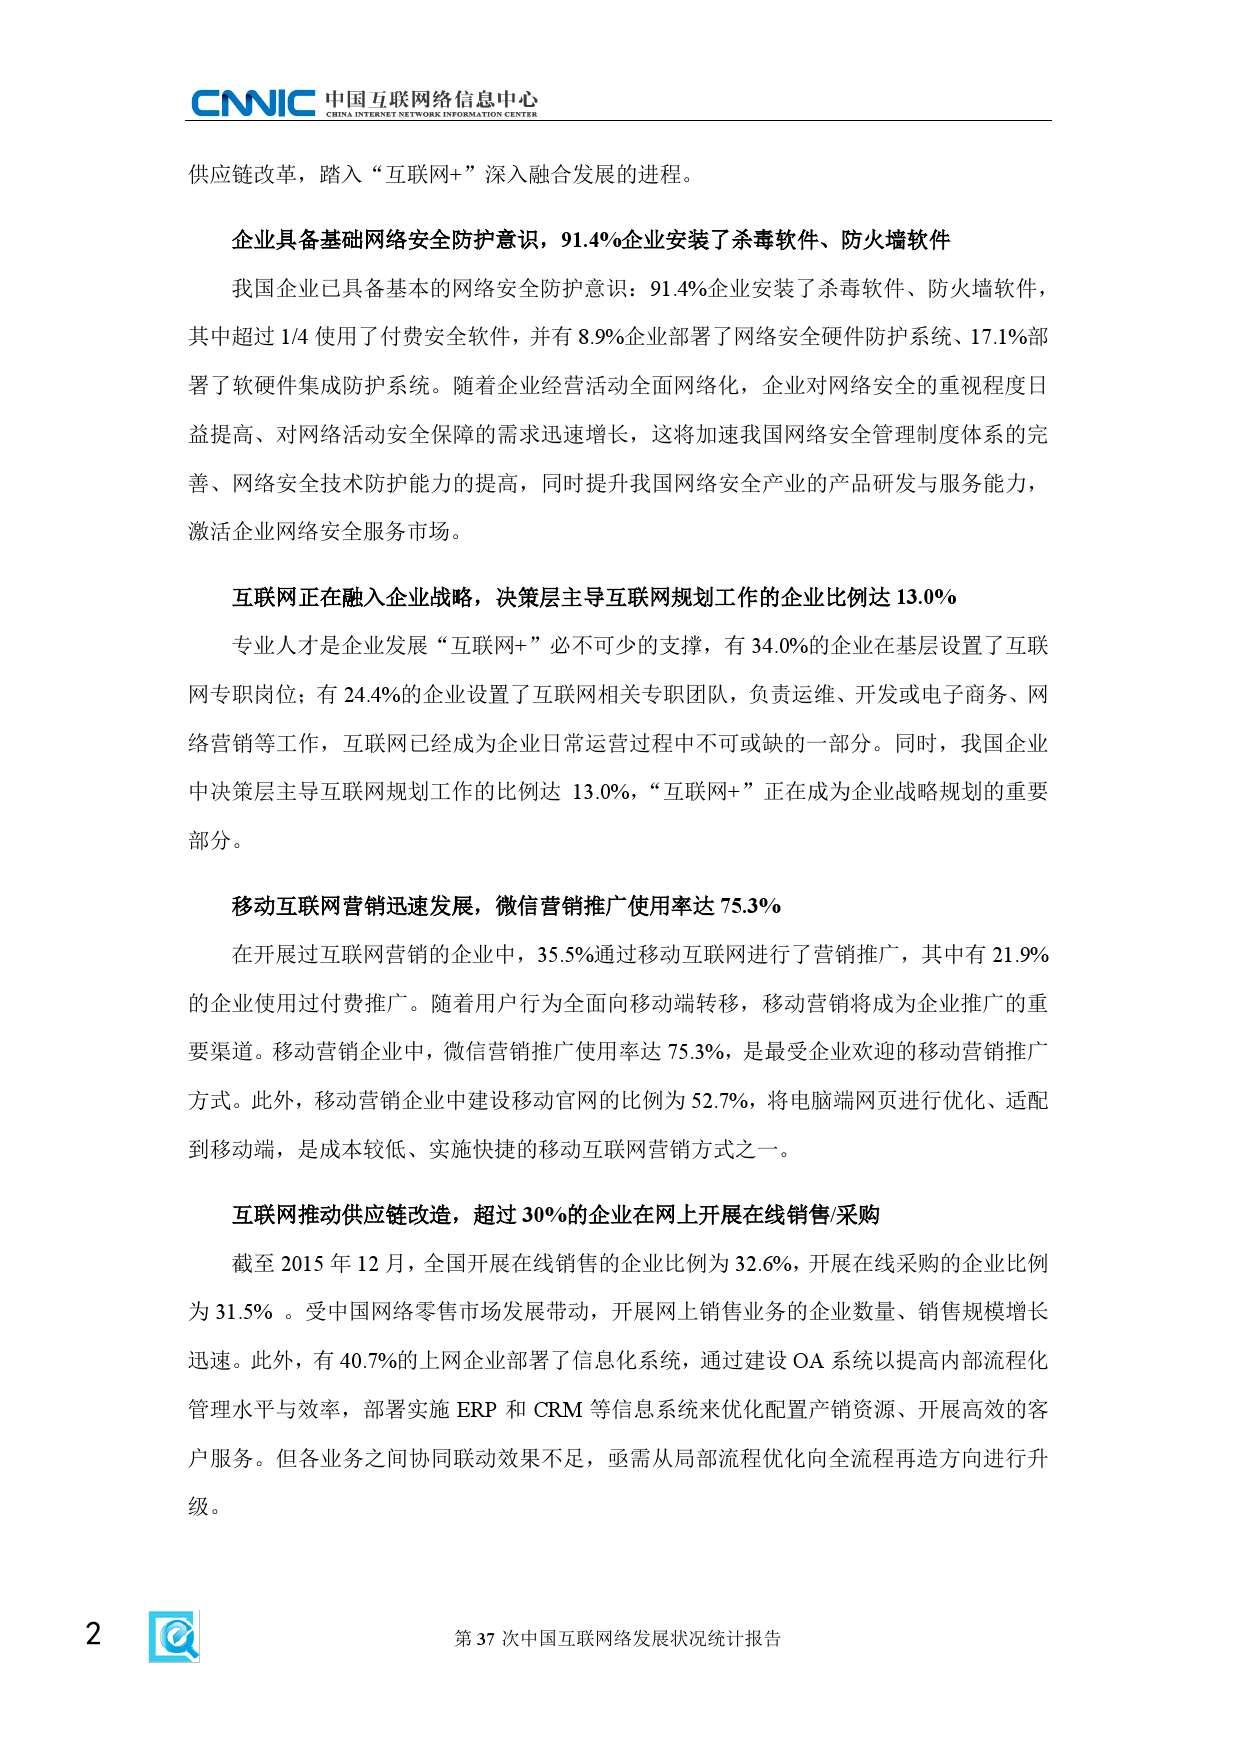 CNNIC:2015年第37次中国互联网络发展状况统计报告_000008